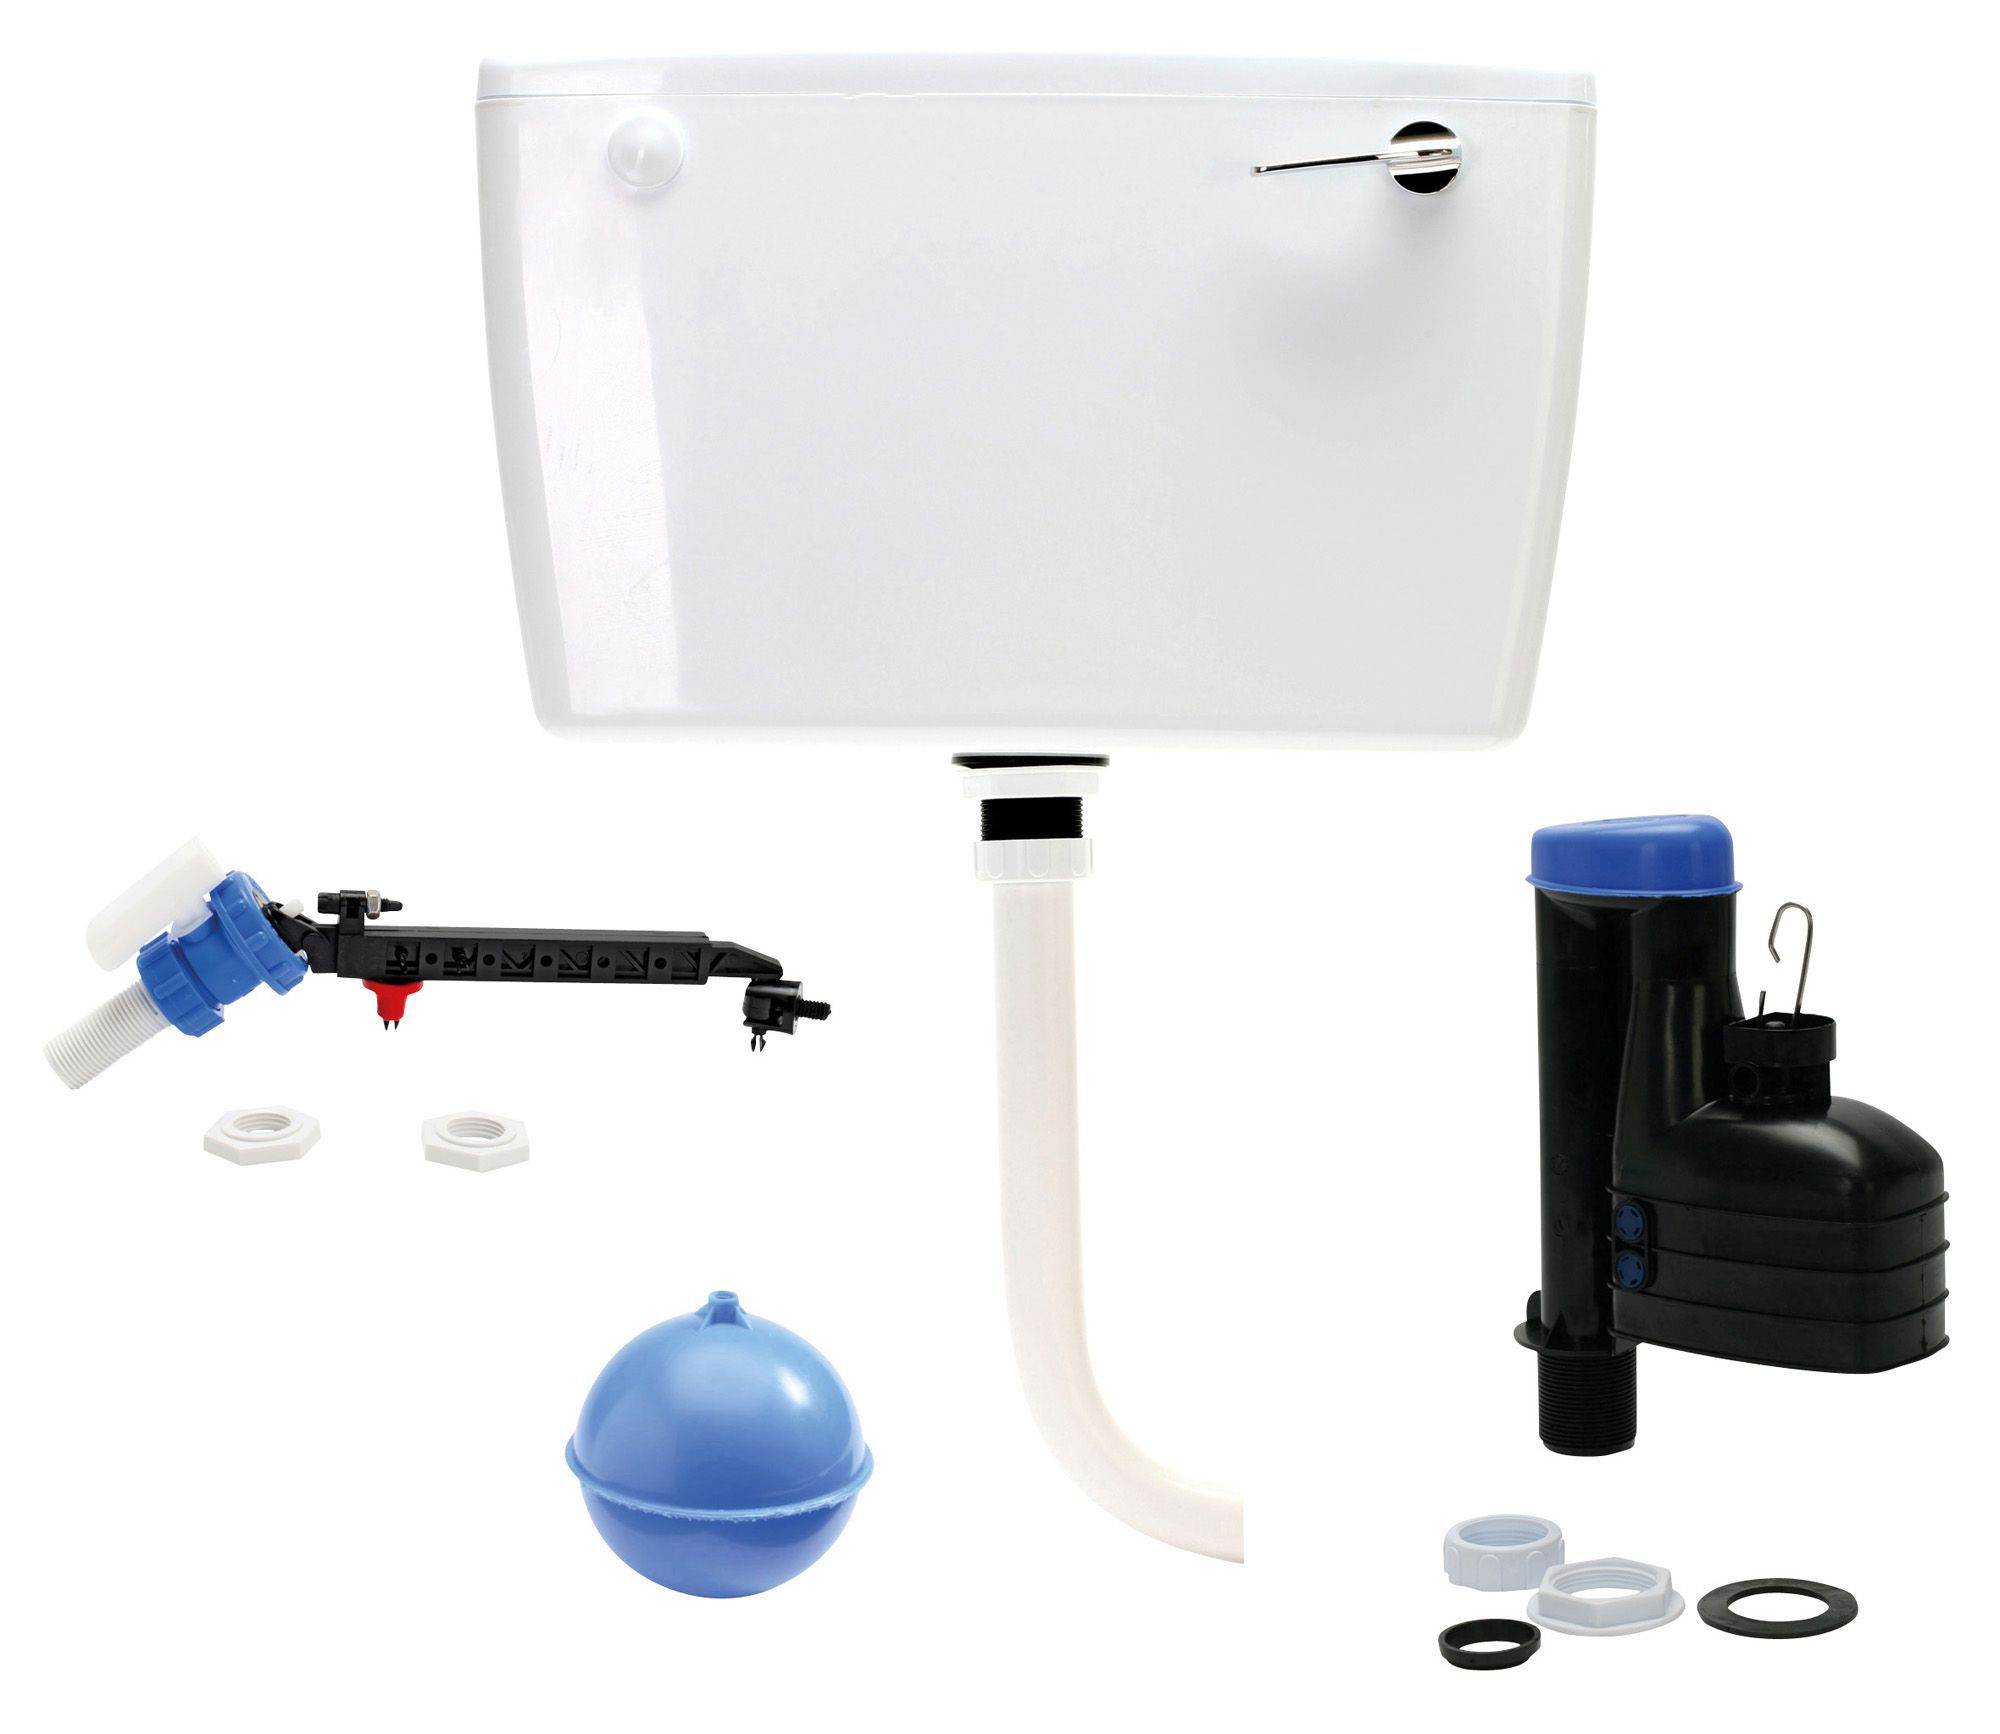 Bathroom cistern fittings - Fluidmaster Exposed Cistern H 340mm W 500mm D 155mm